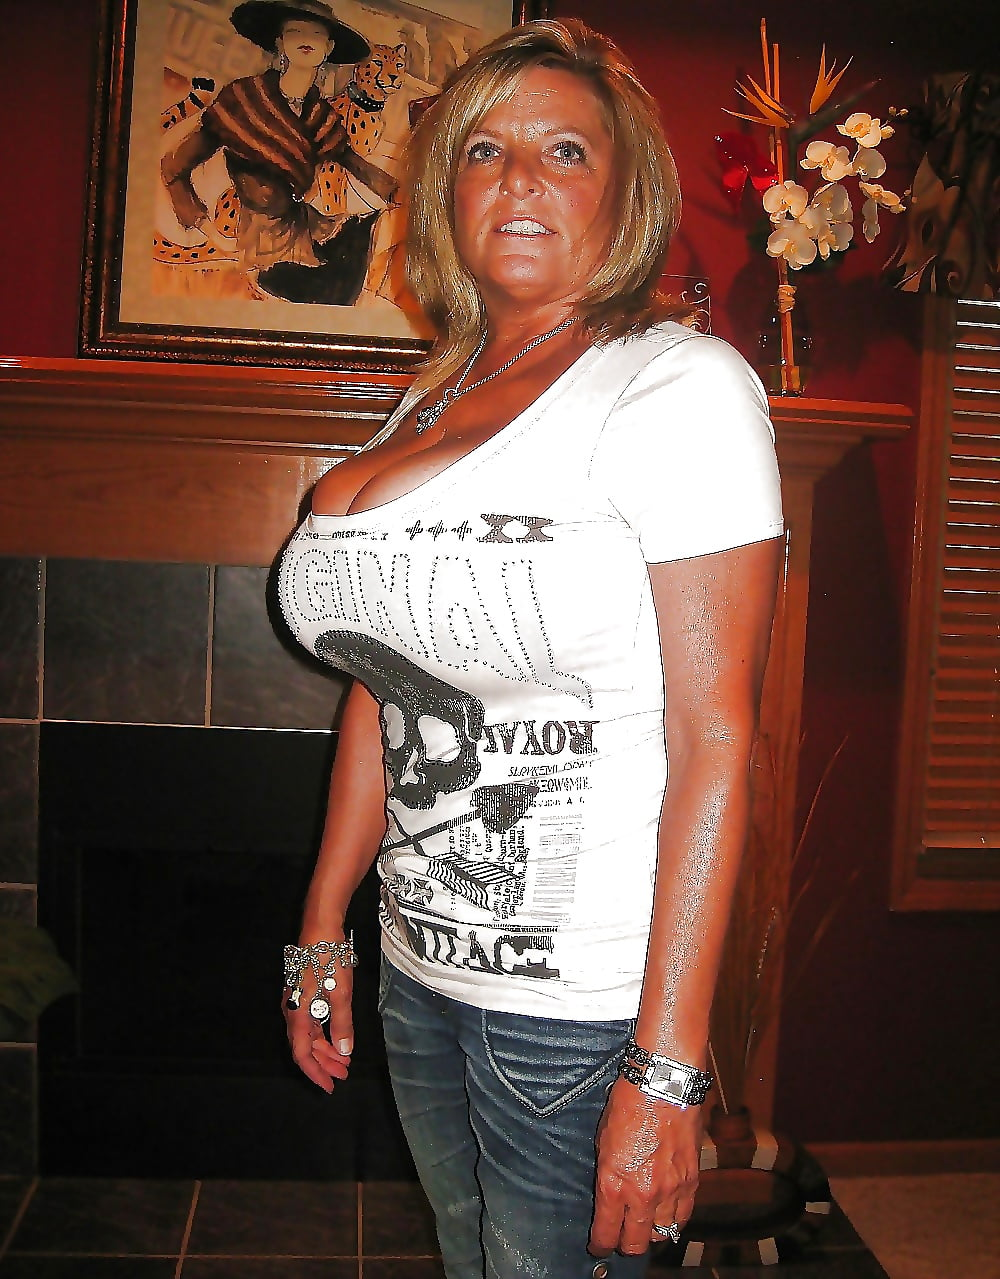 Lori grenier boobs telegraph